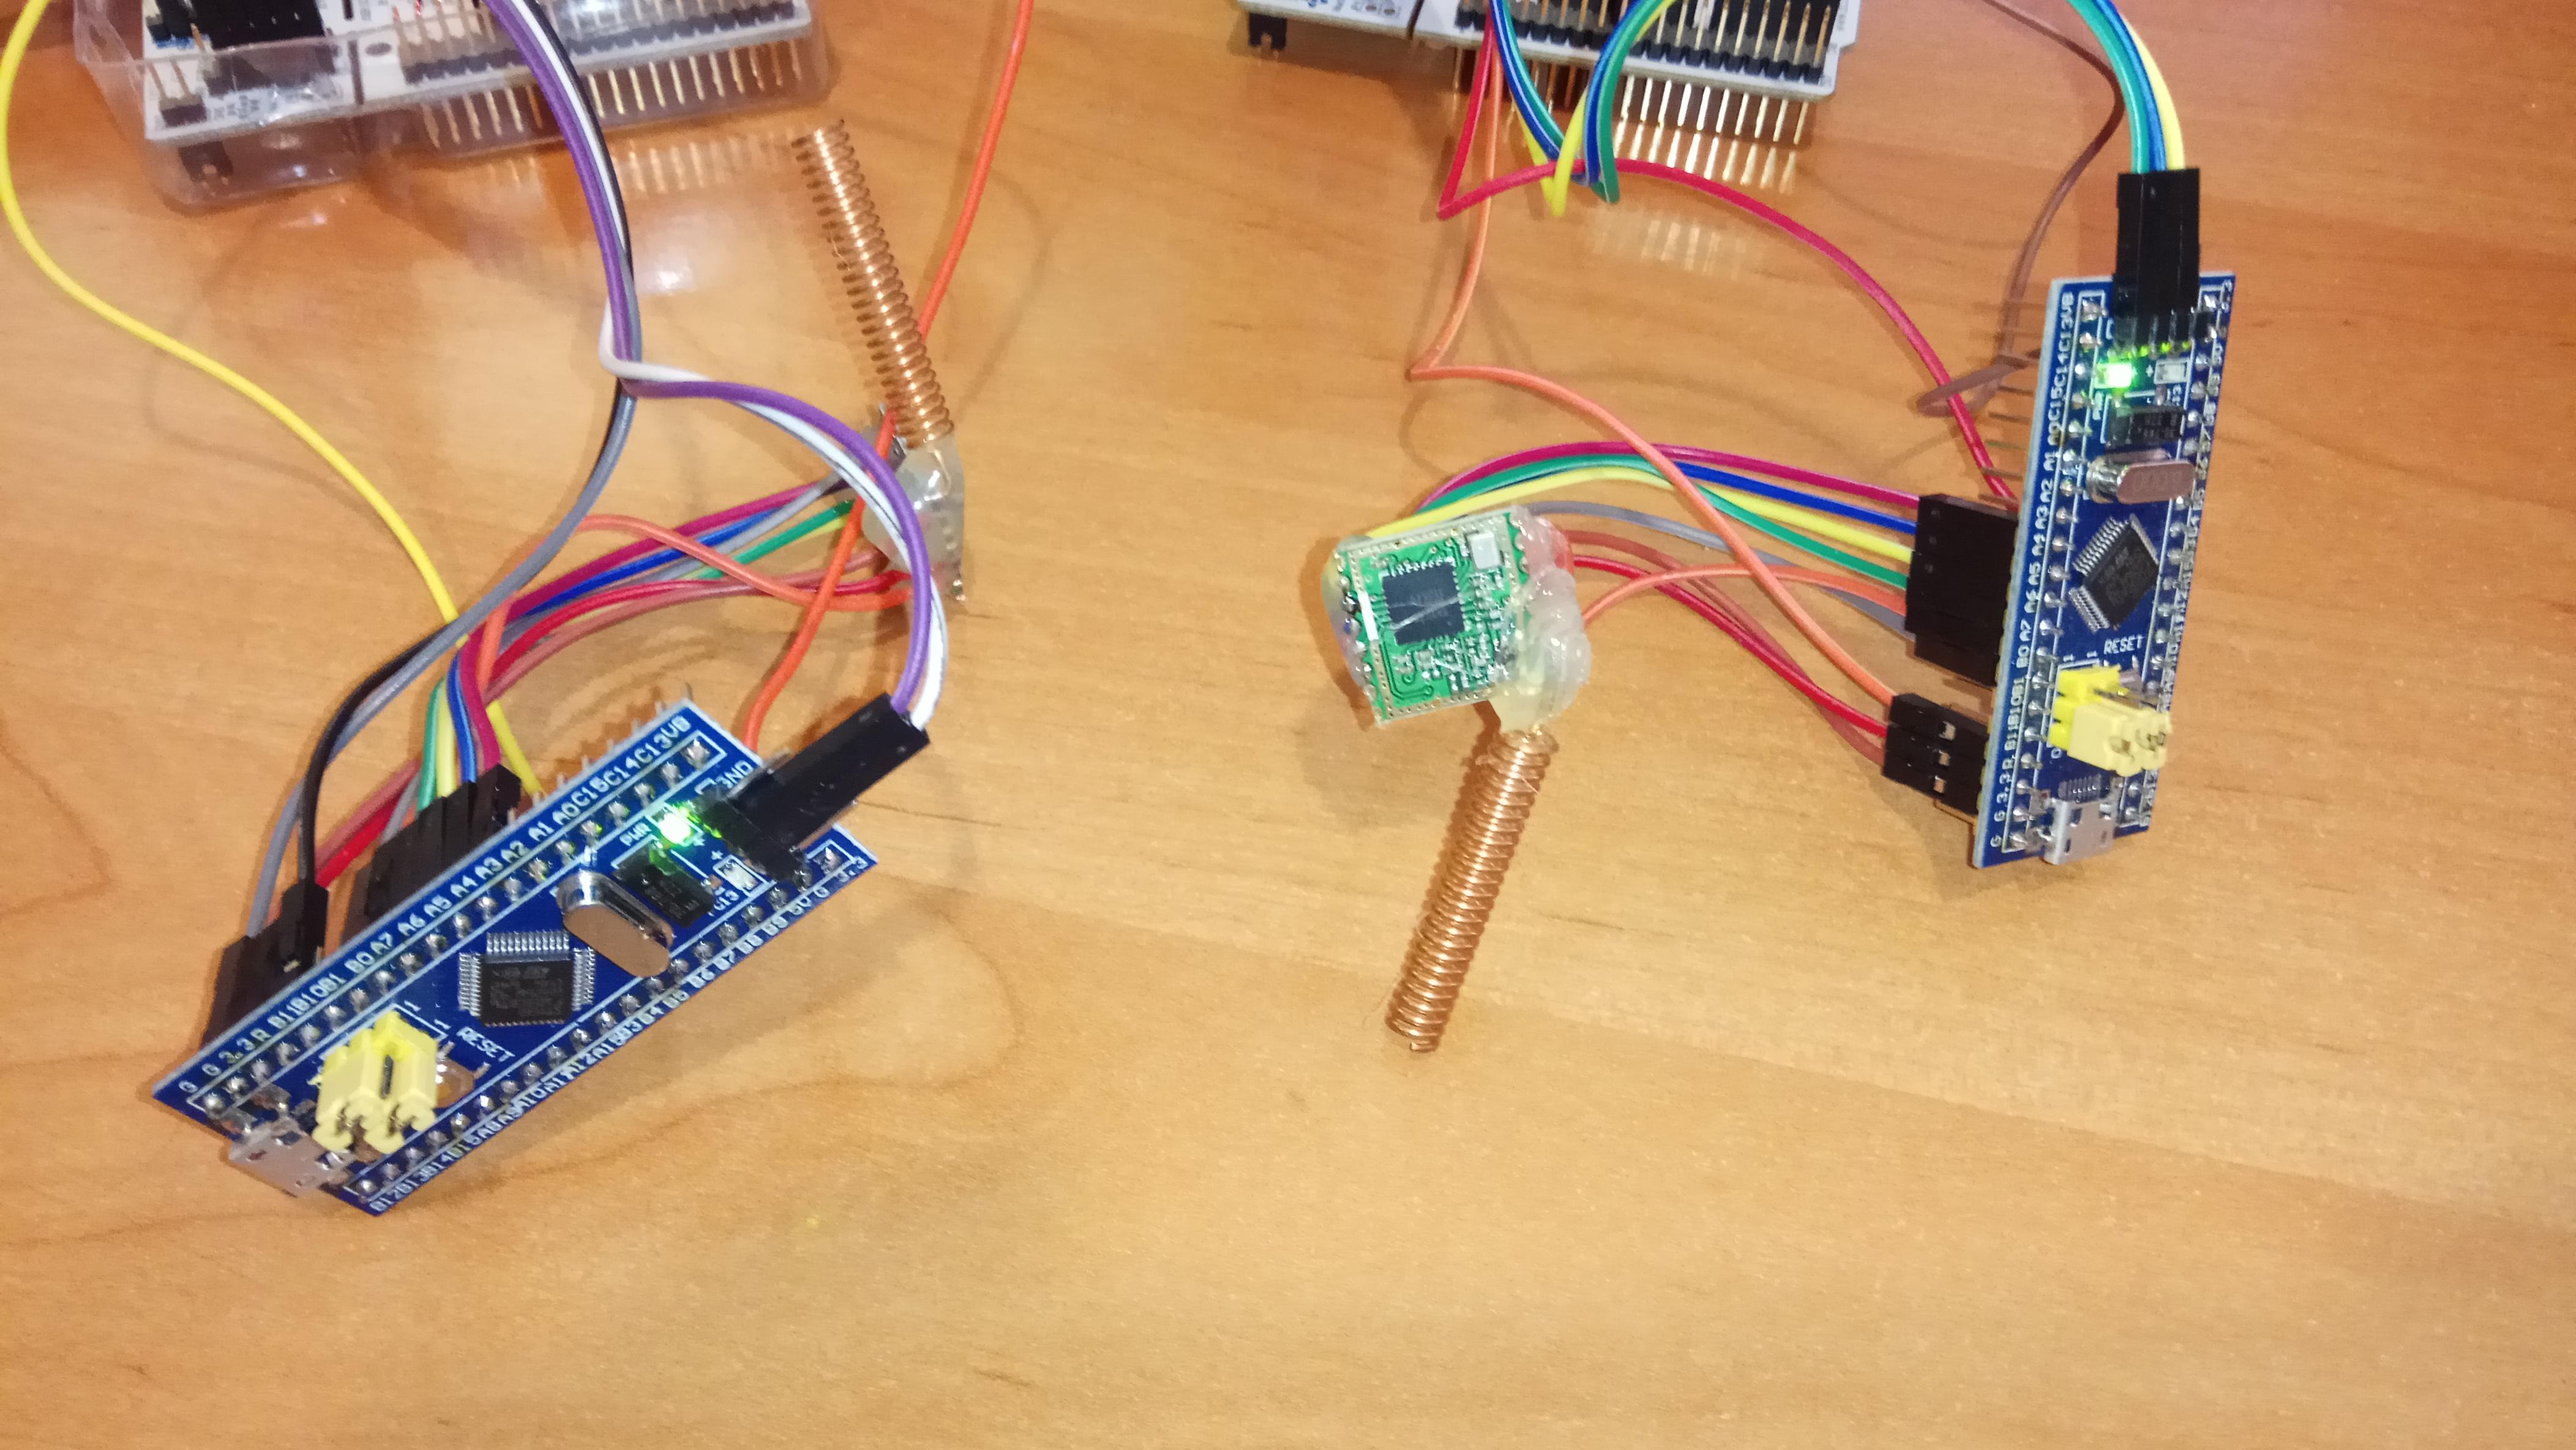 STM32 HAL driver for LoRa SX1278 wireless module | Wojciech Domski Blog